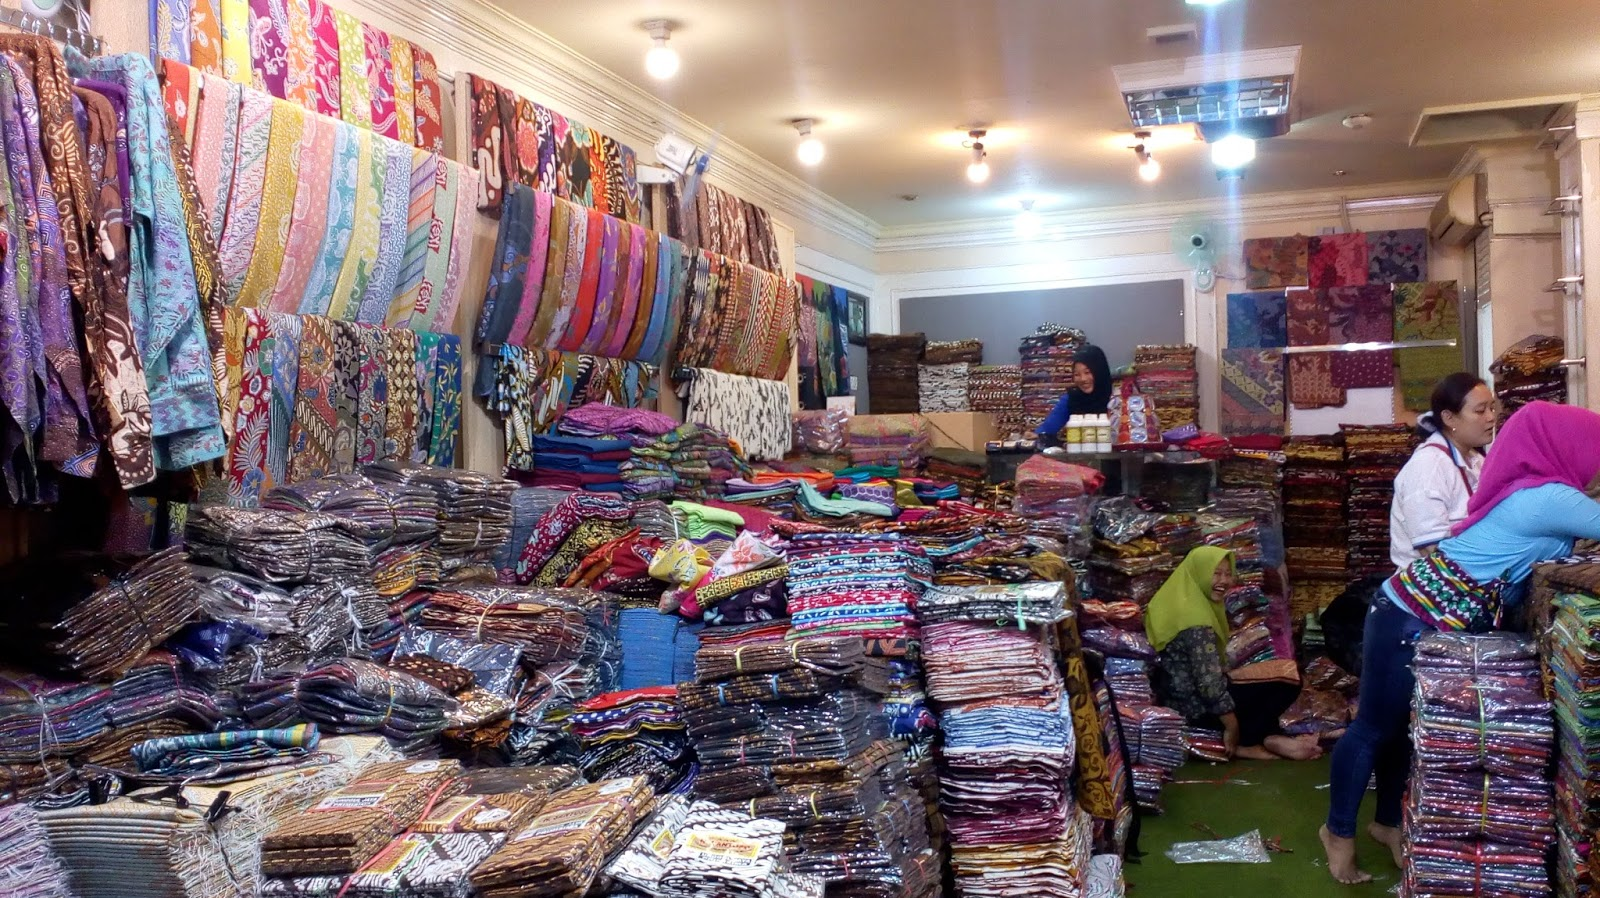 nofilawati anisa jmp pusat batik rh nofianisa blogspot com toko batik di sby toko batik di surabaya barat